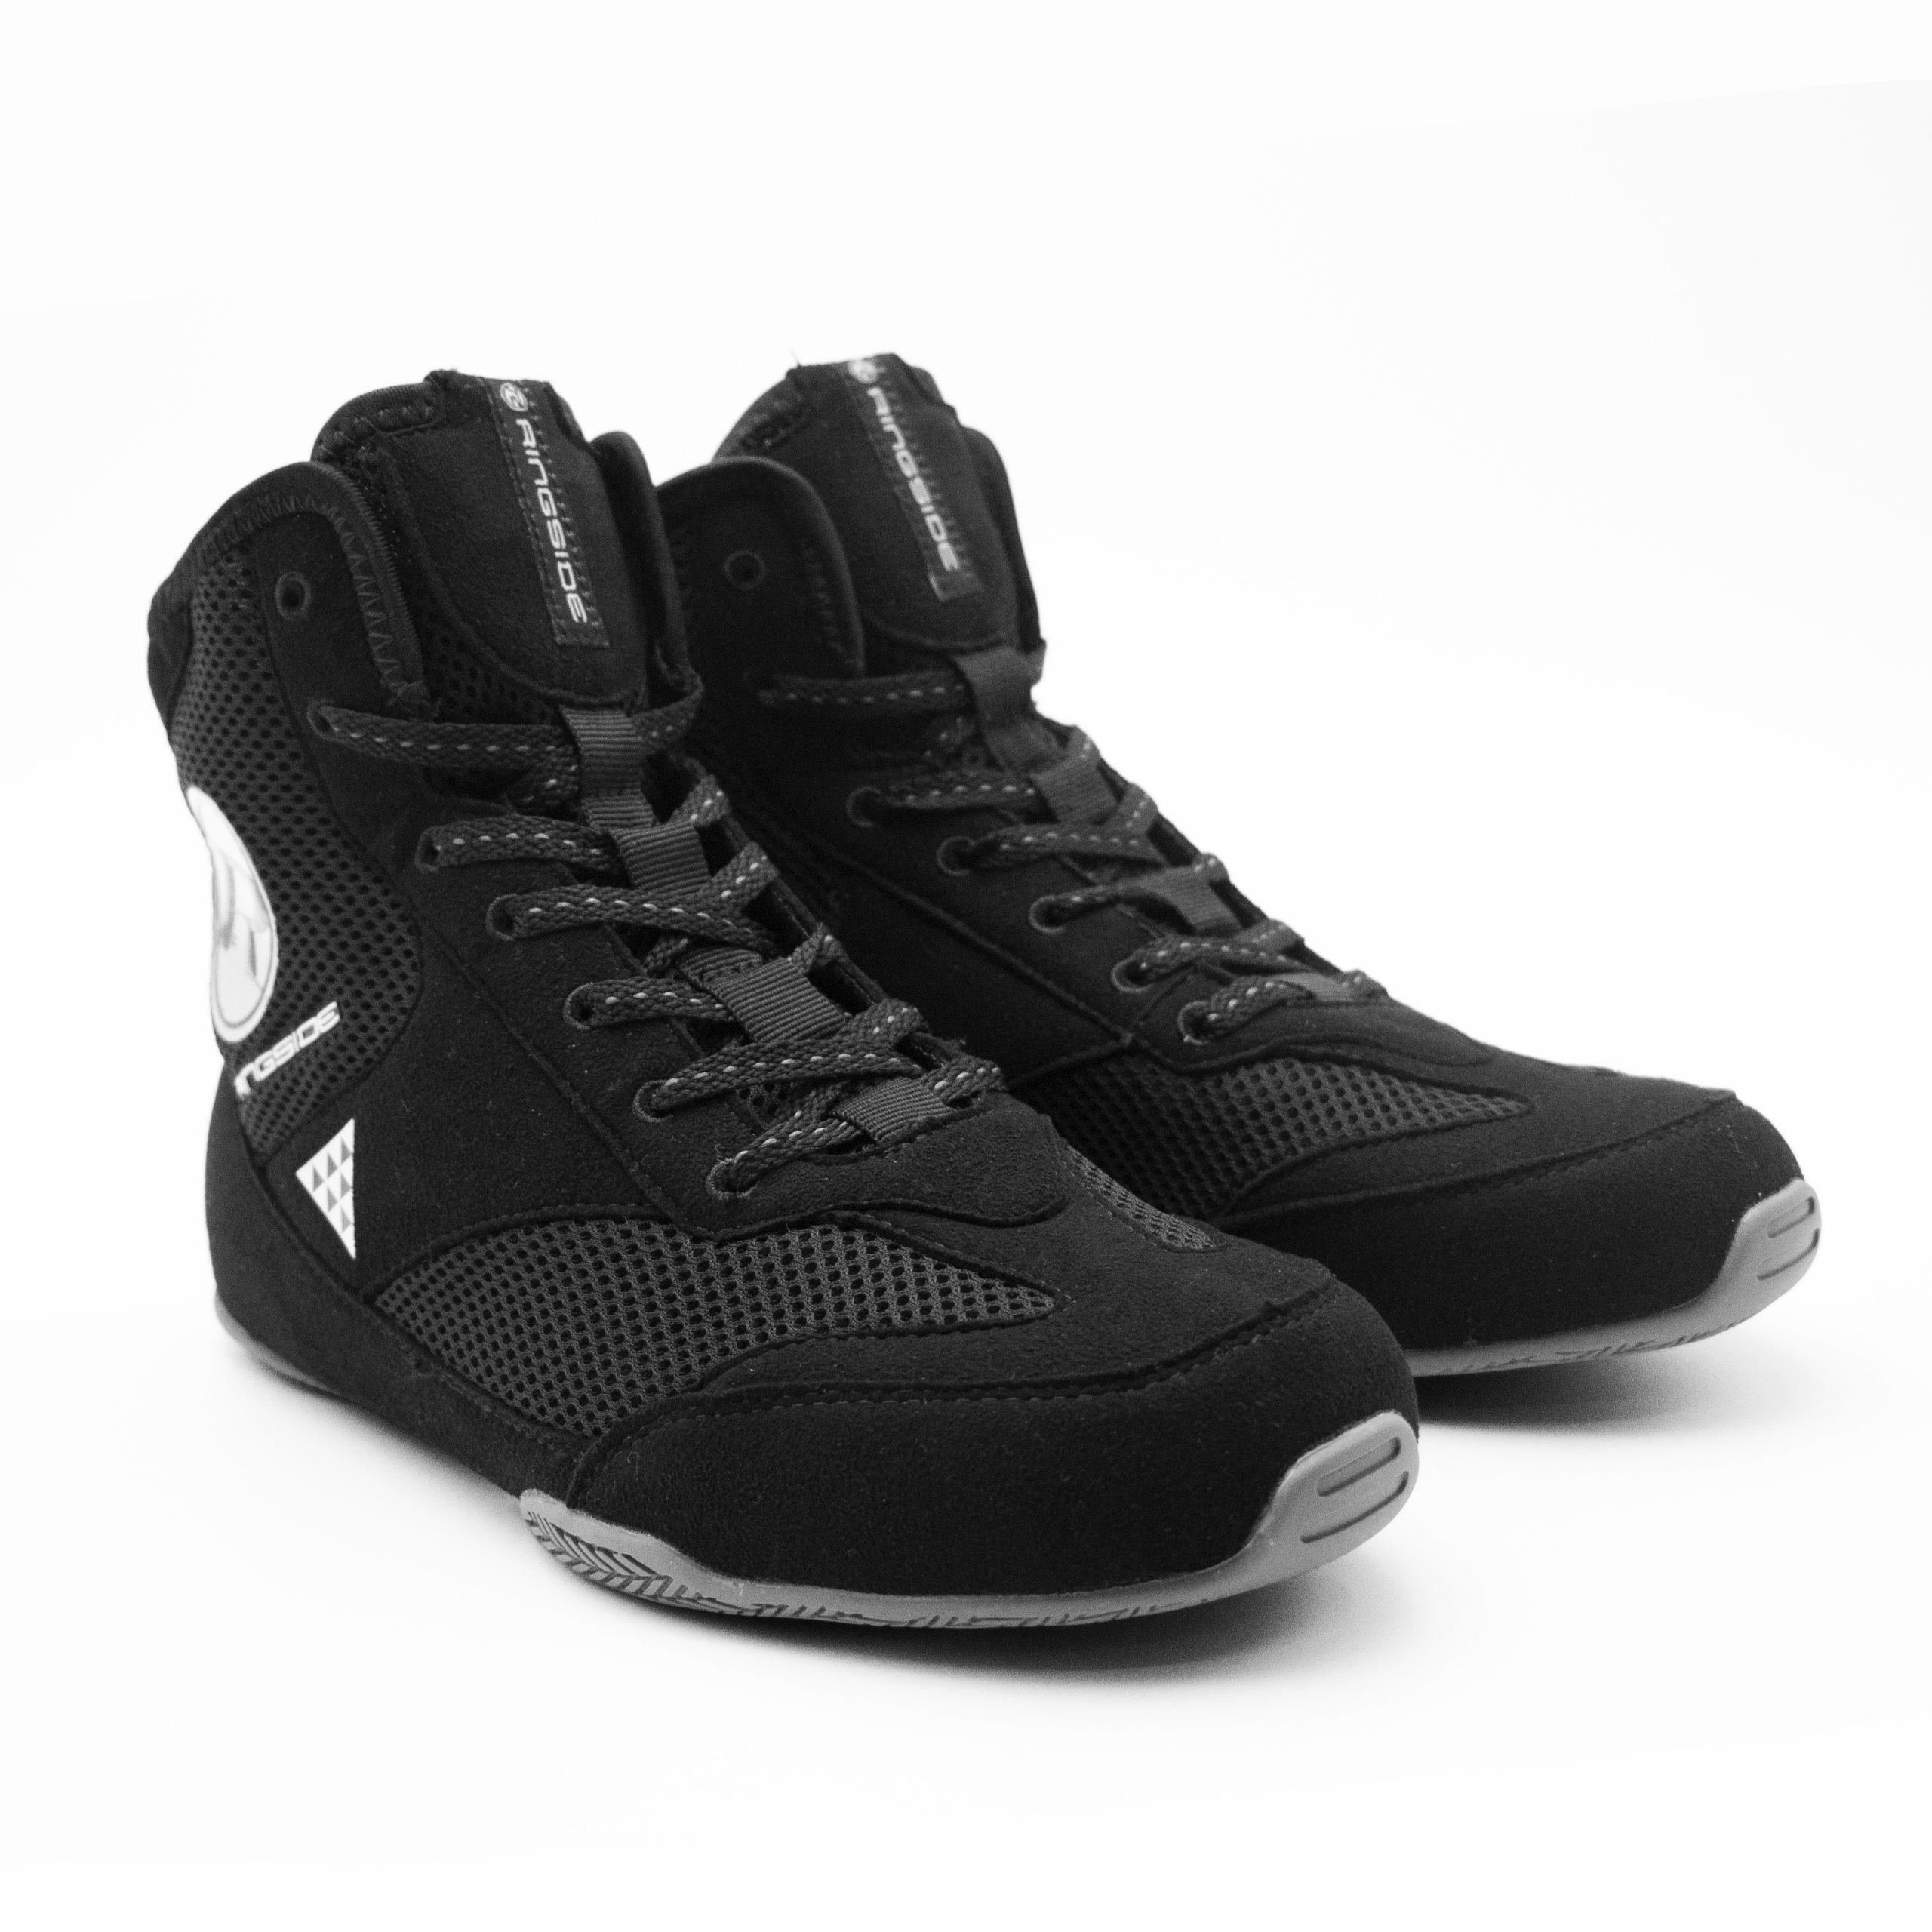 black-silver-pair